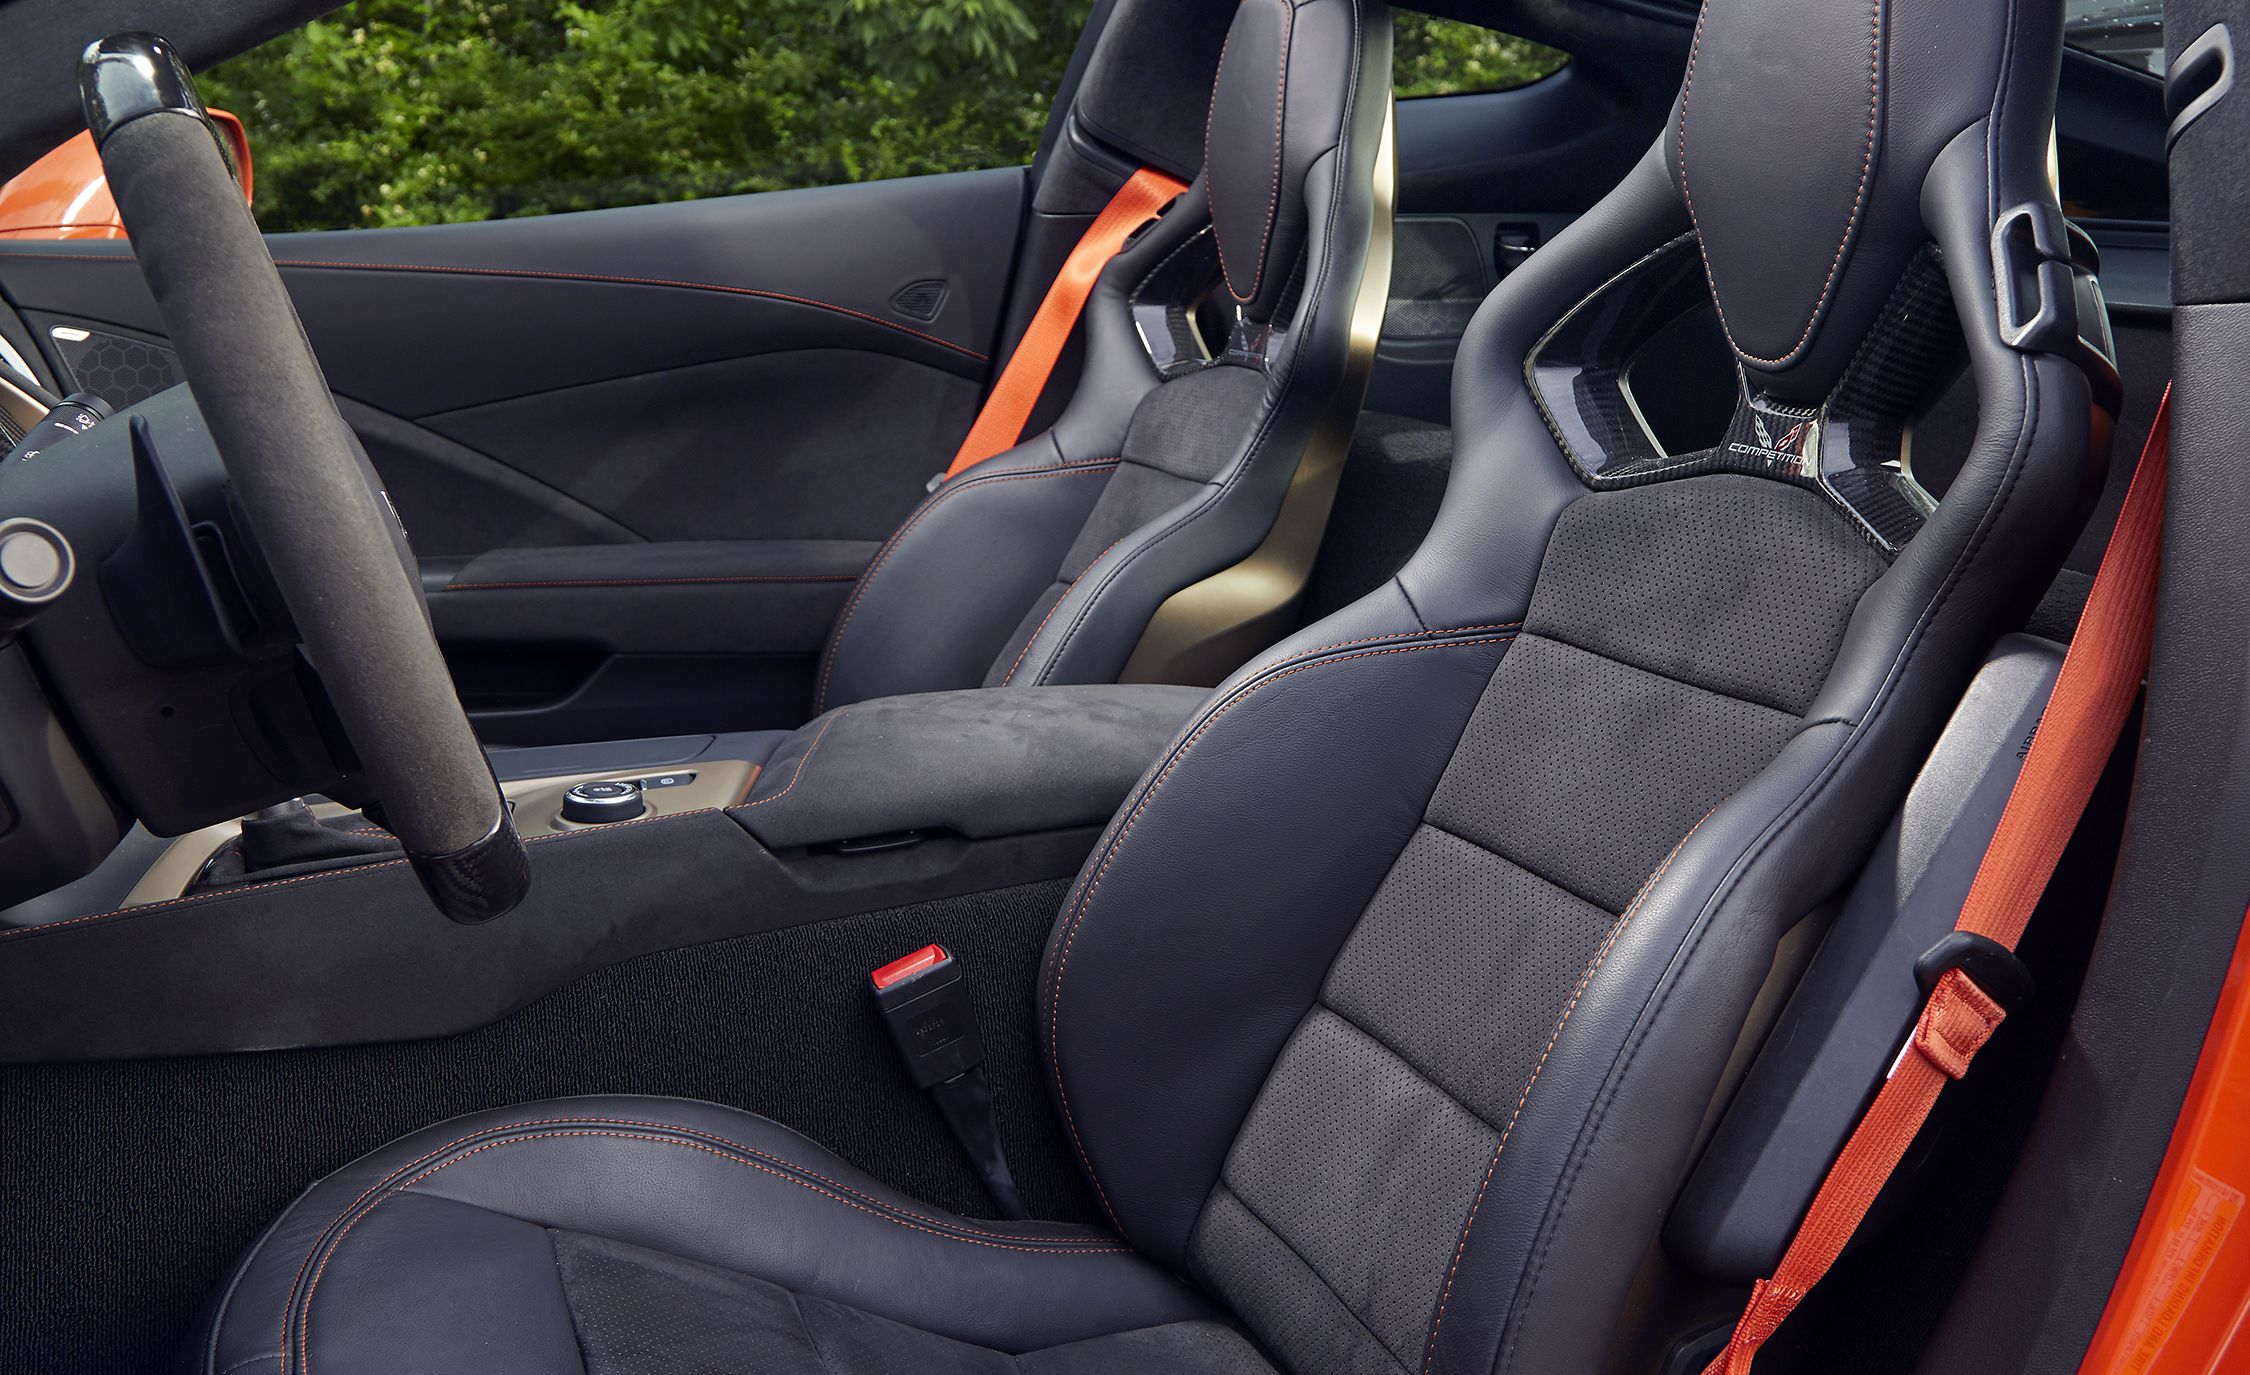 2019 Chevrolet Corvette ZR1 Interior Seats Wallpaper (13)